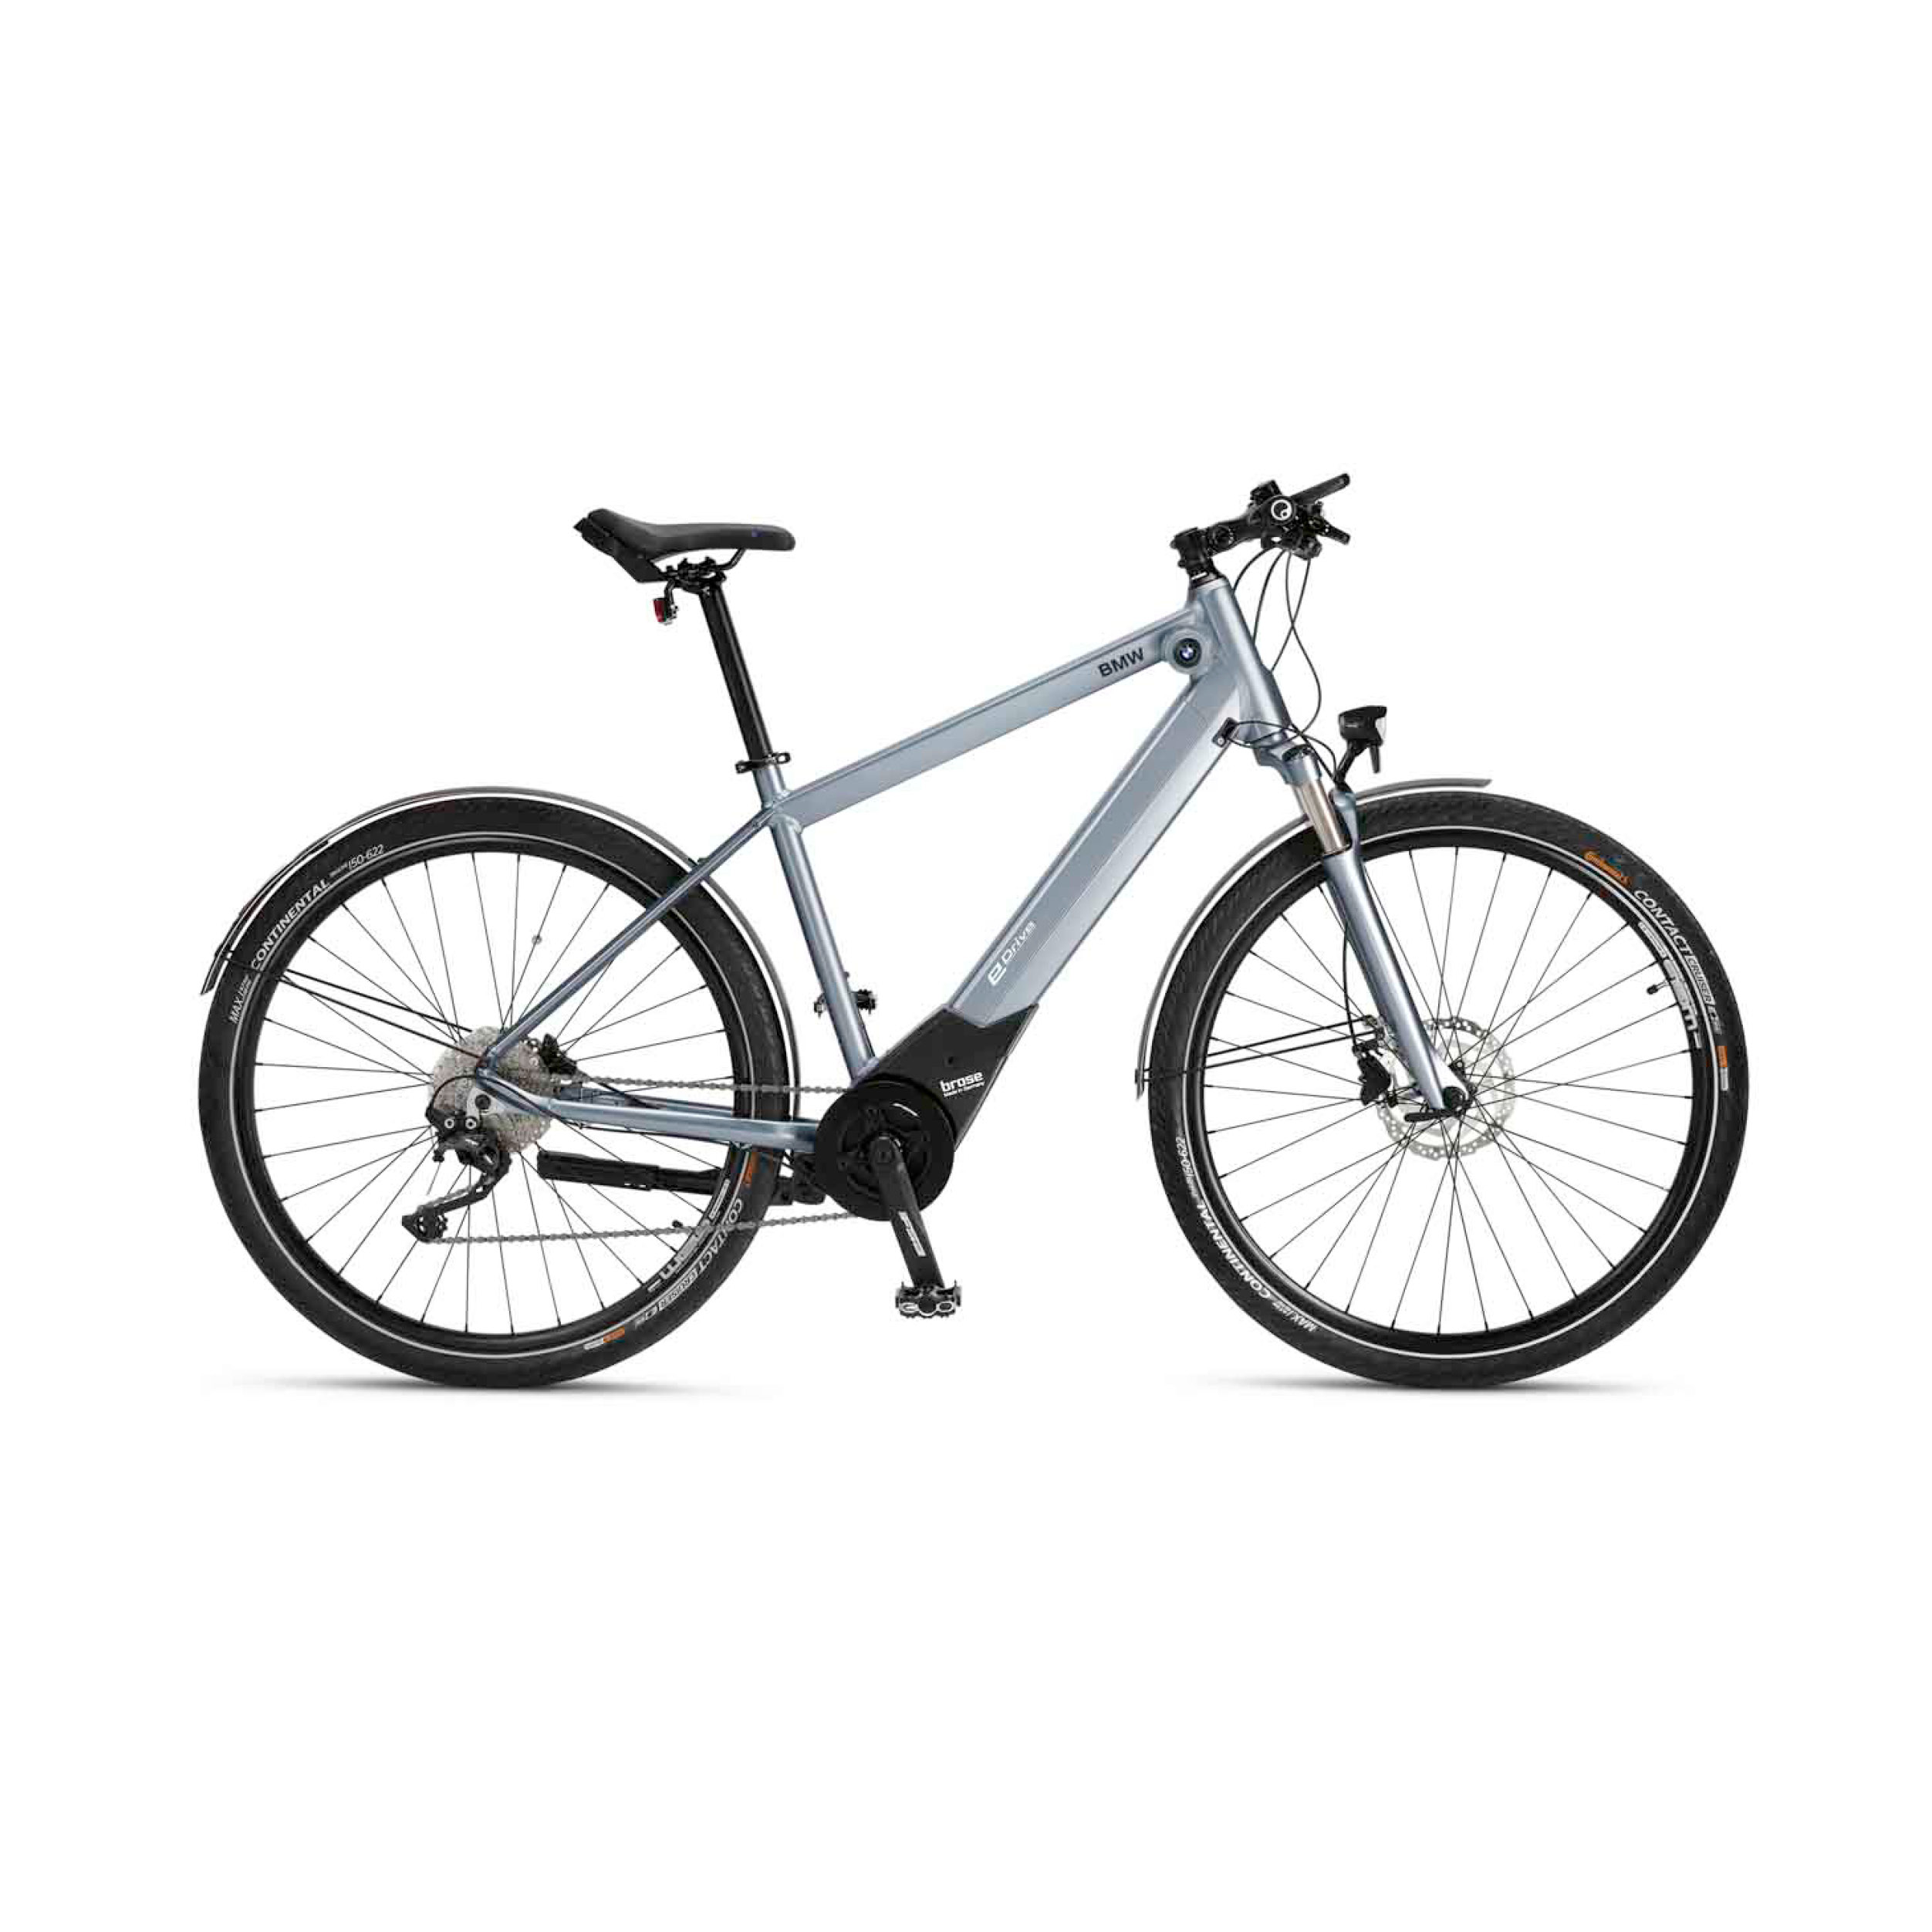 Bmw Active Hybrid E Bike Bluewater Metallic